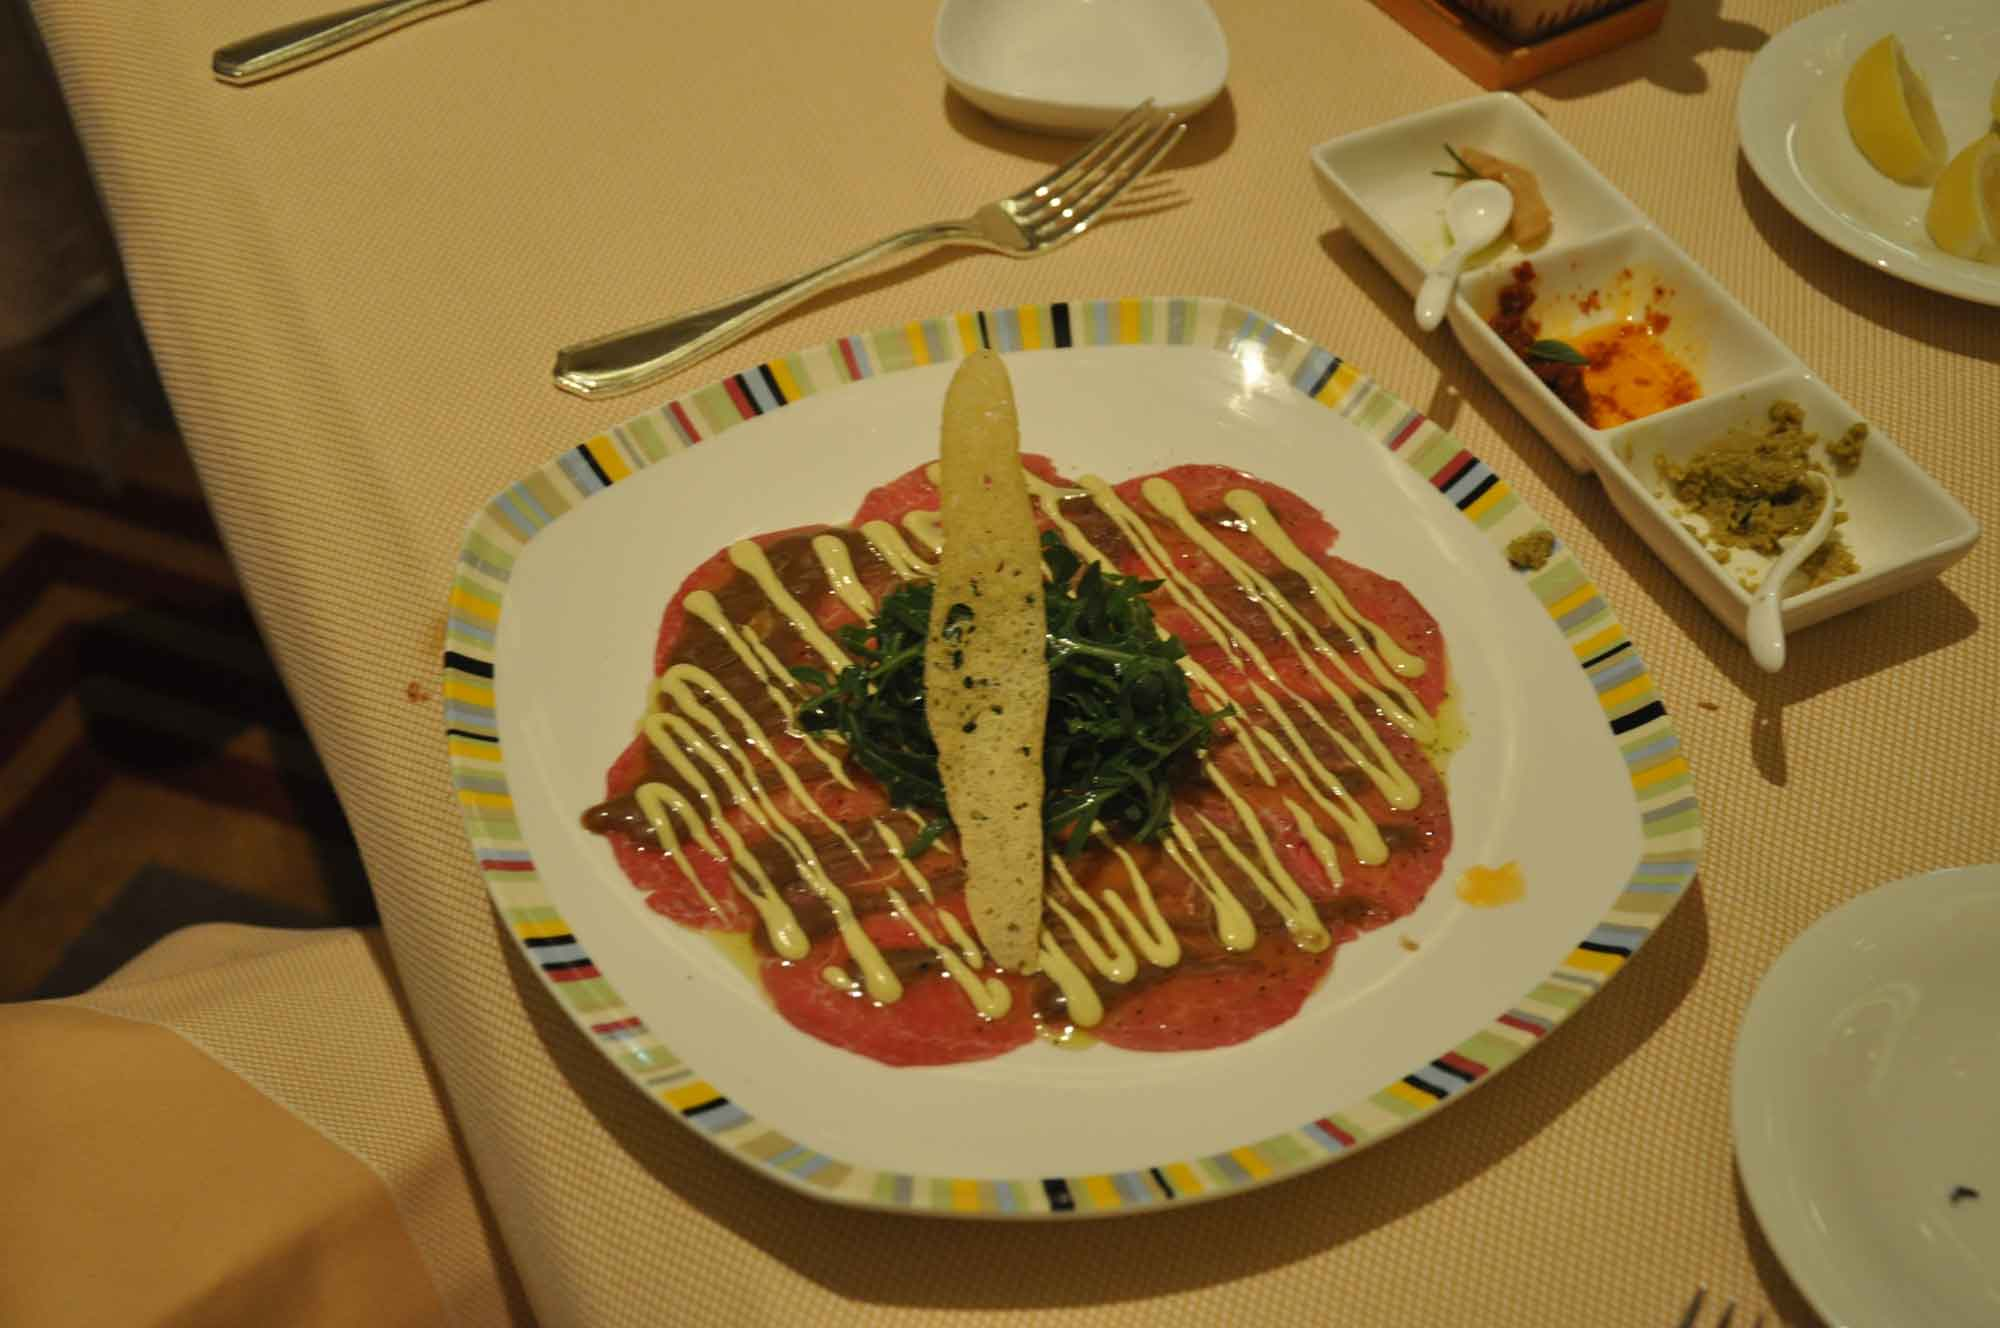 Terrazza Macau beef carpaccio